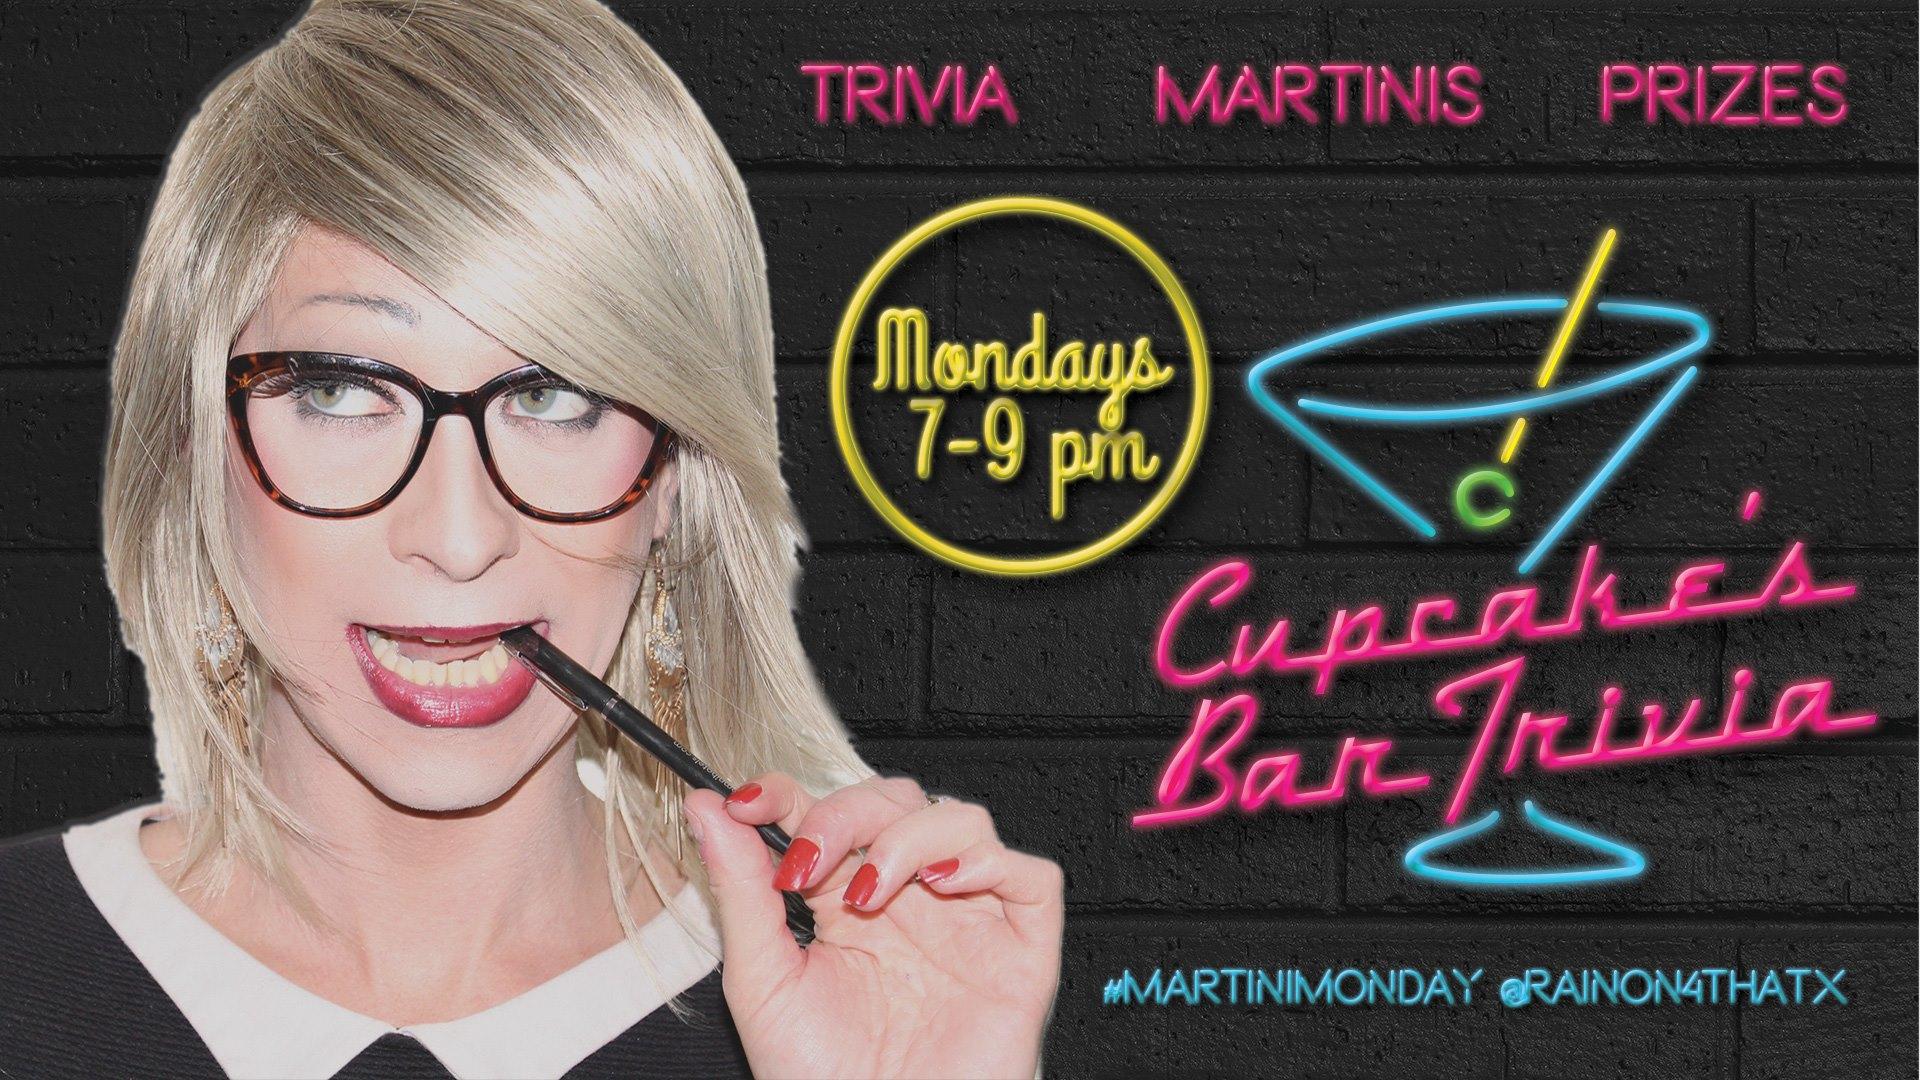 CupCake Bar Trivia